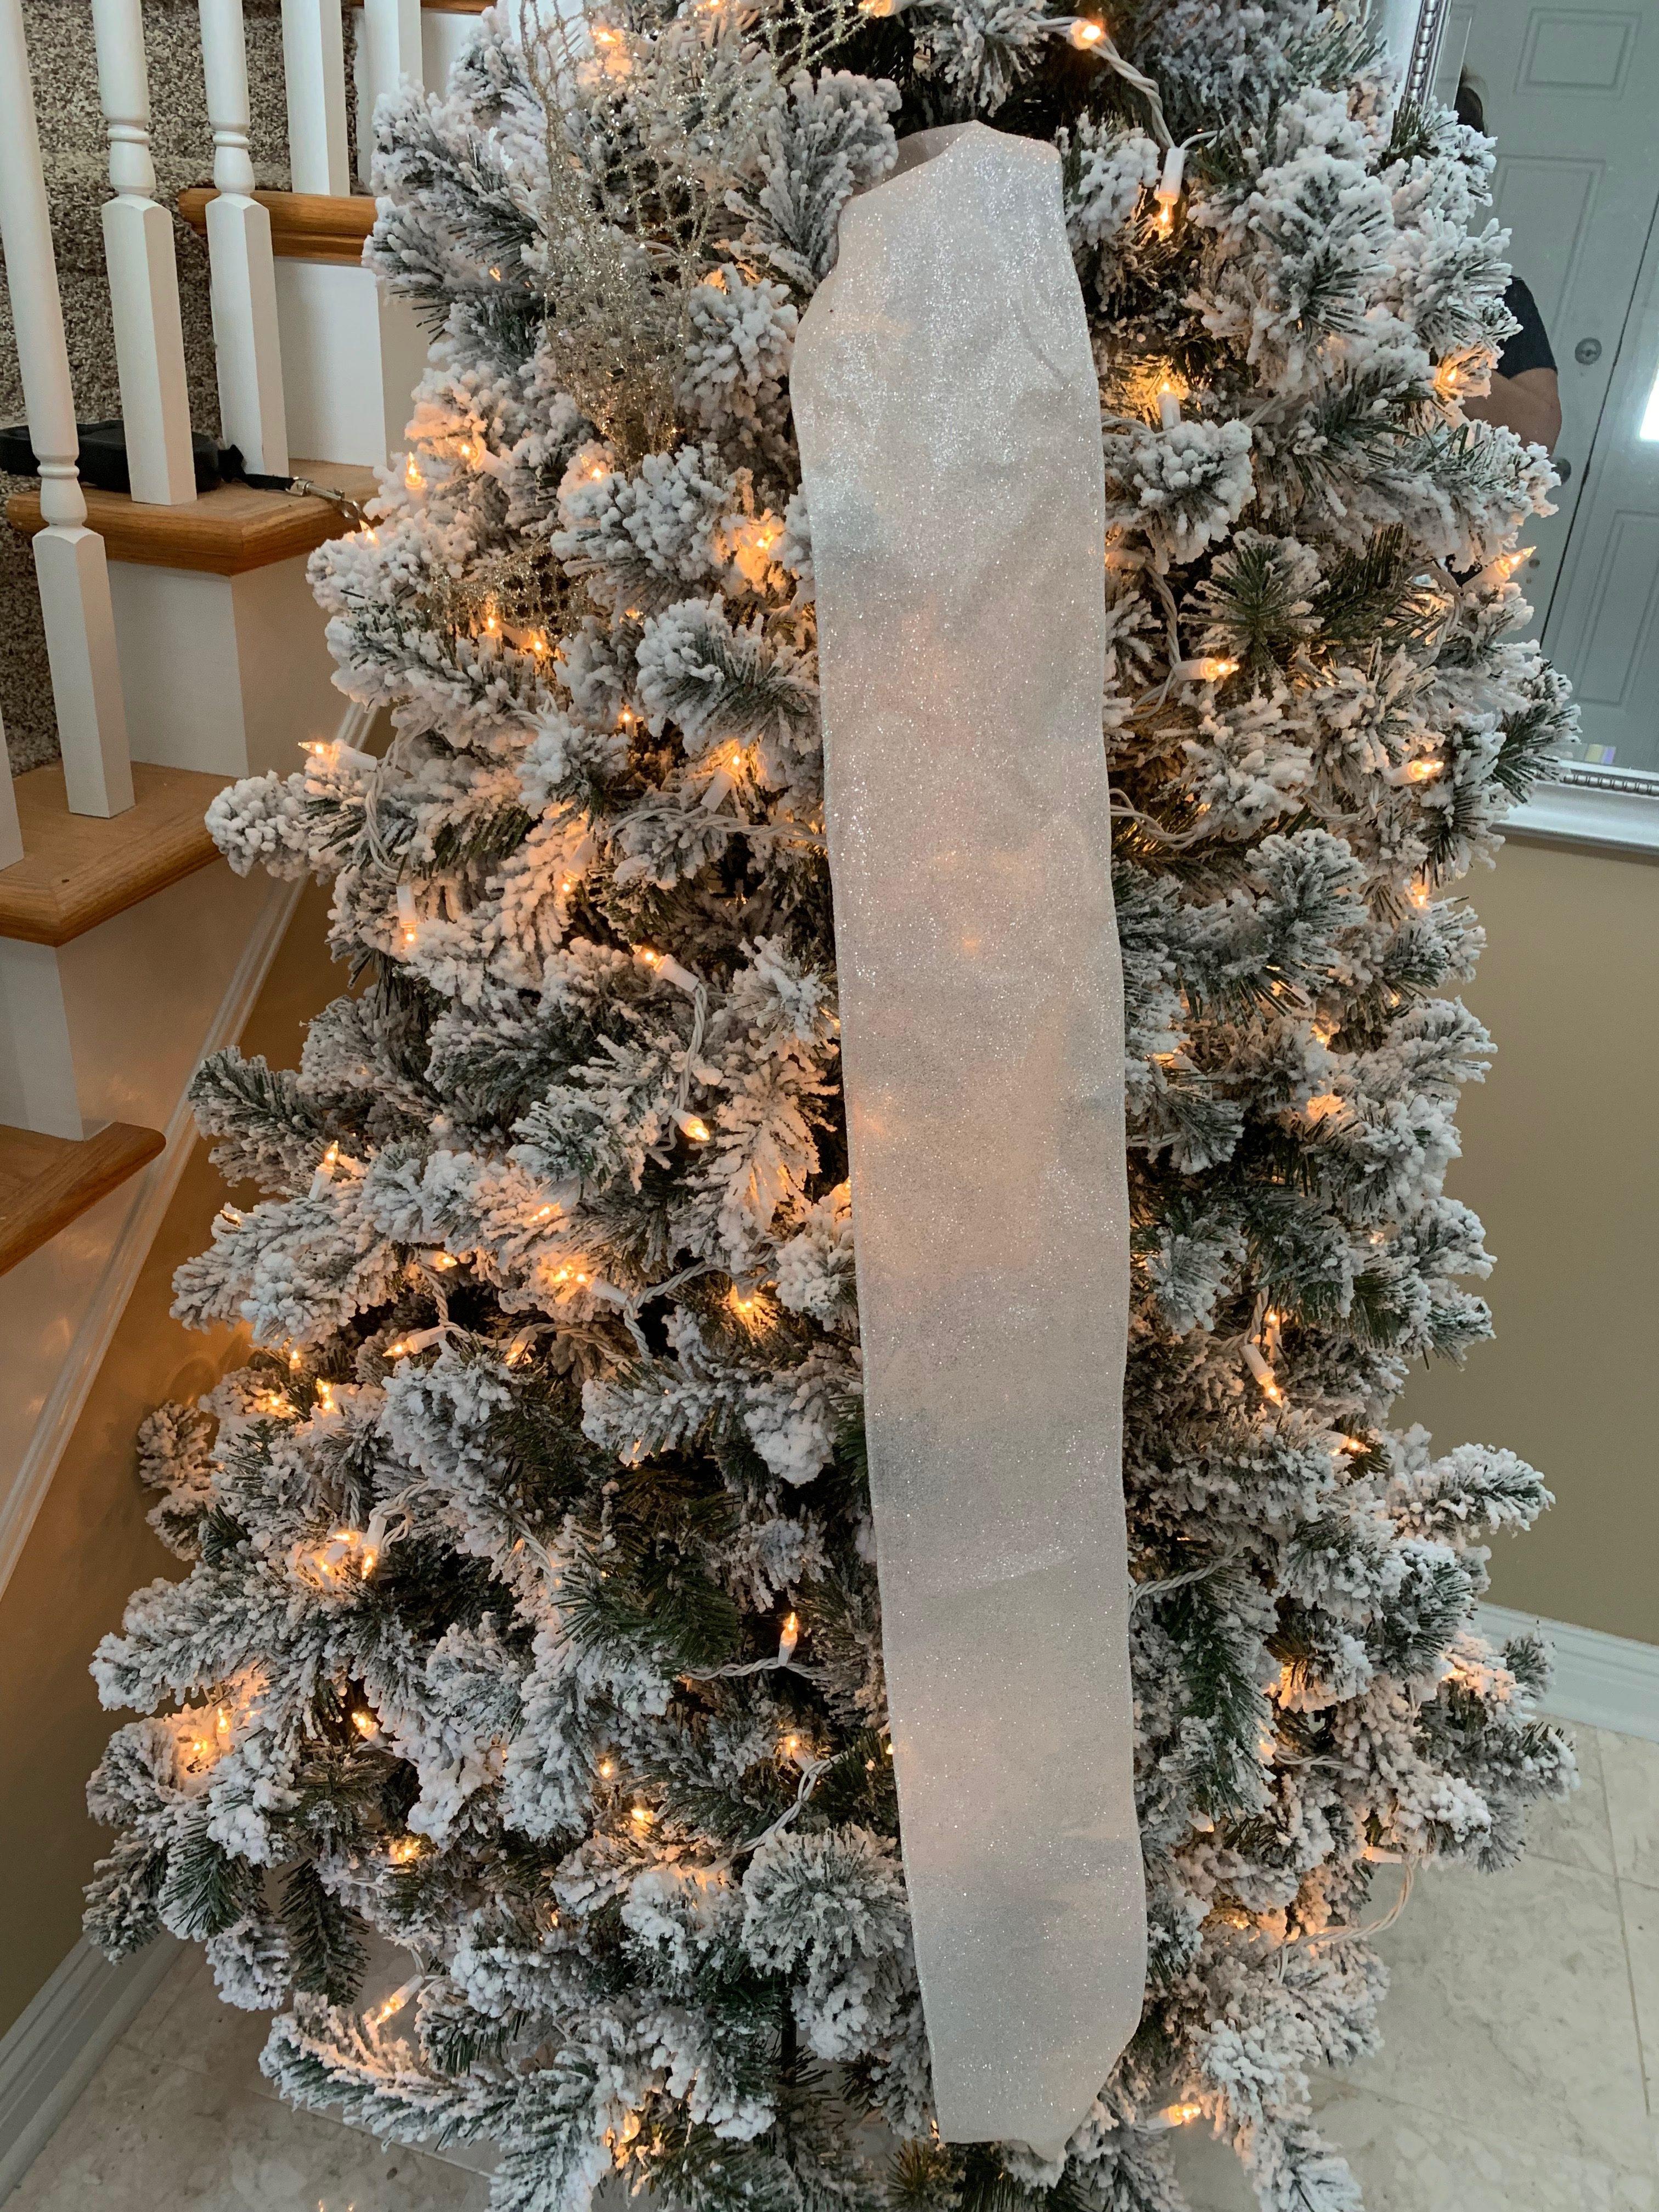 How to Add Ribbon to a Christmas Tree. #christmastree #ribbongarland #christmas